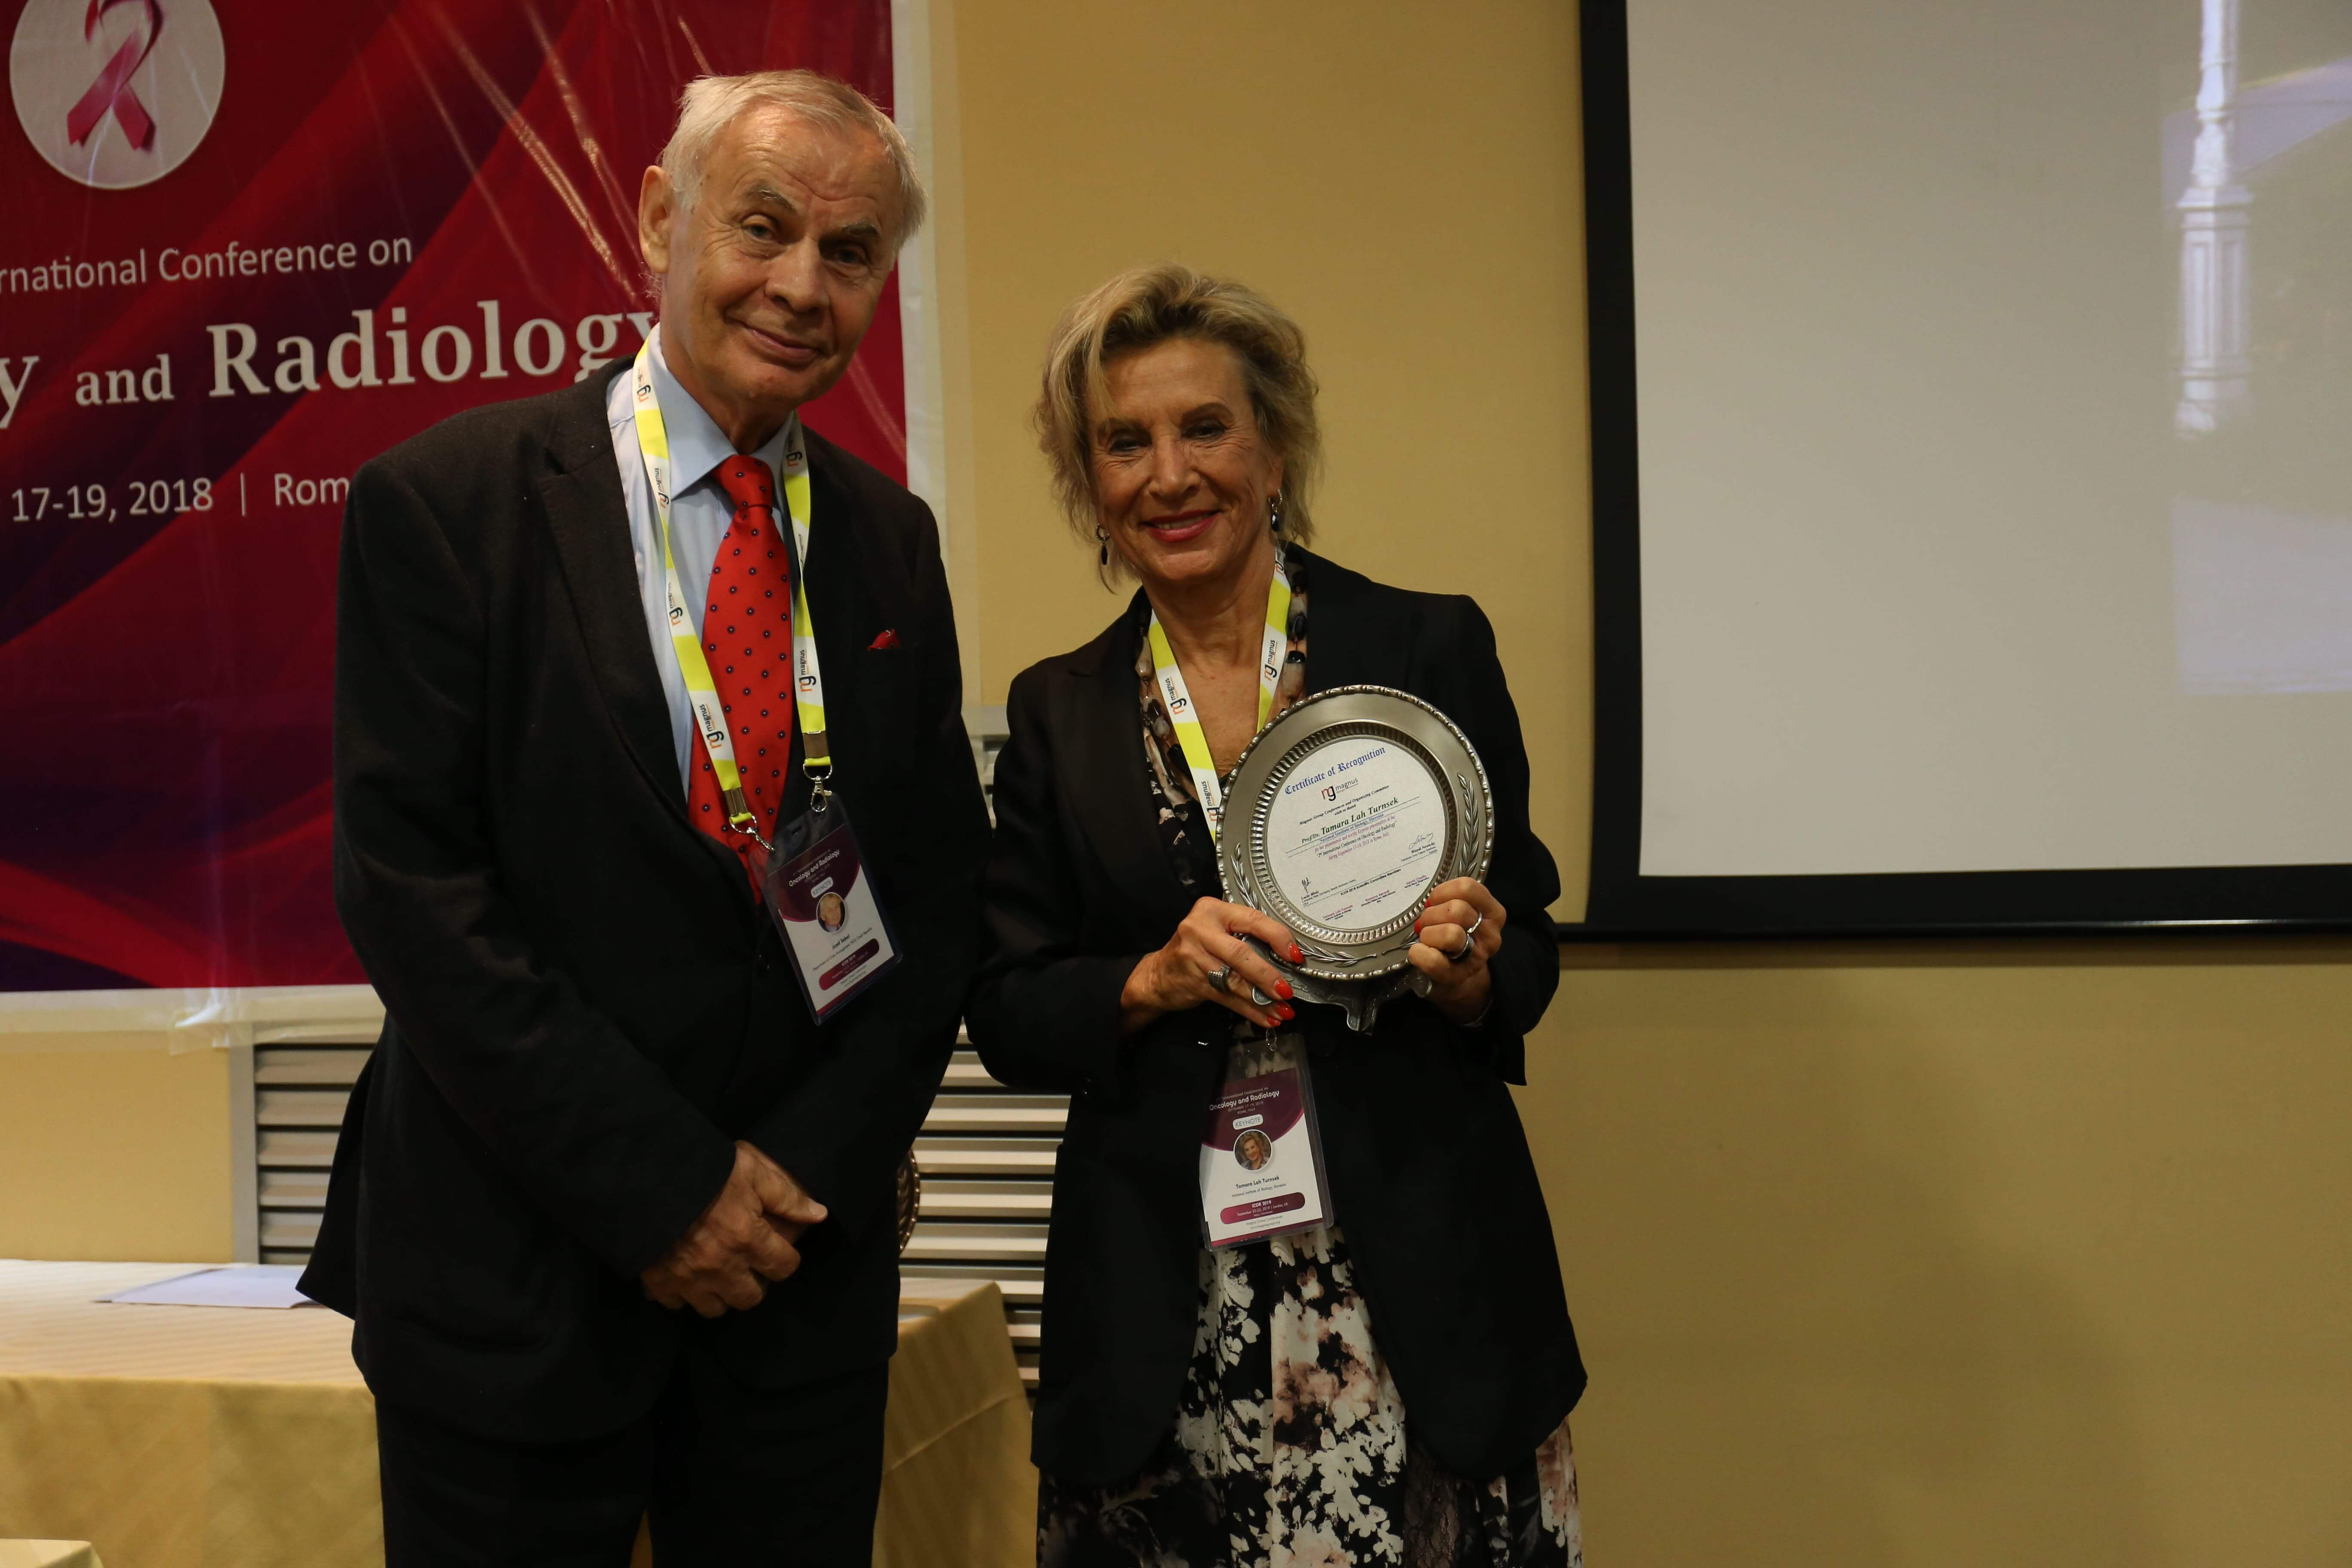 Cancer Conferences - Tamara Lah Turnsek